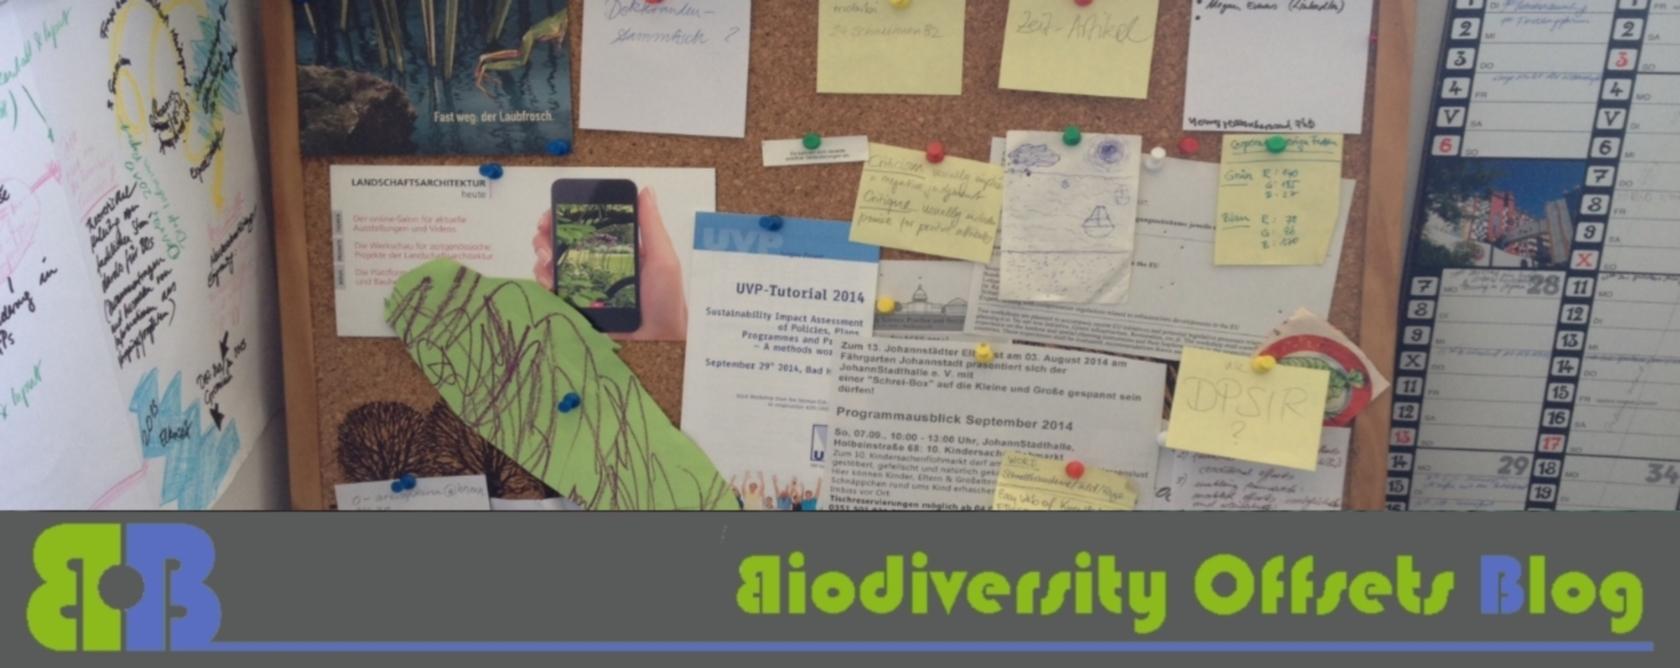 Biodiversity Offsets Blog Logo_hellgruen_PhD_1680